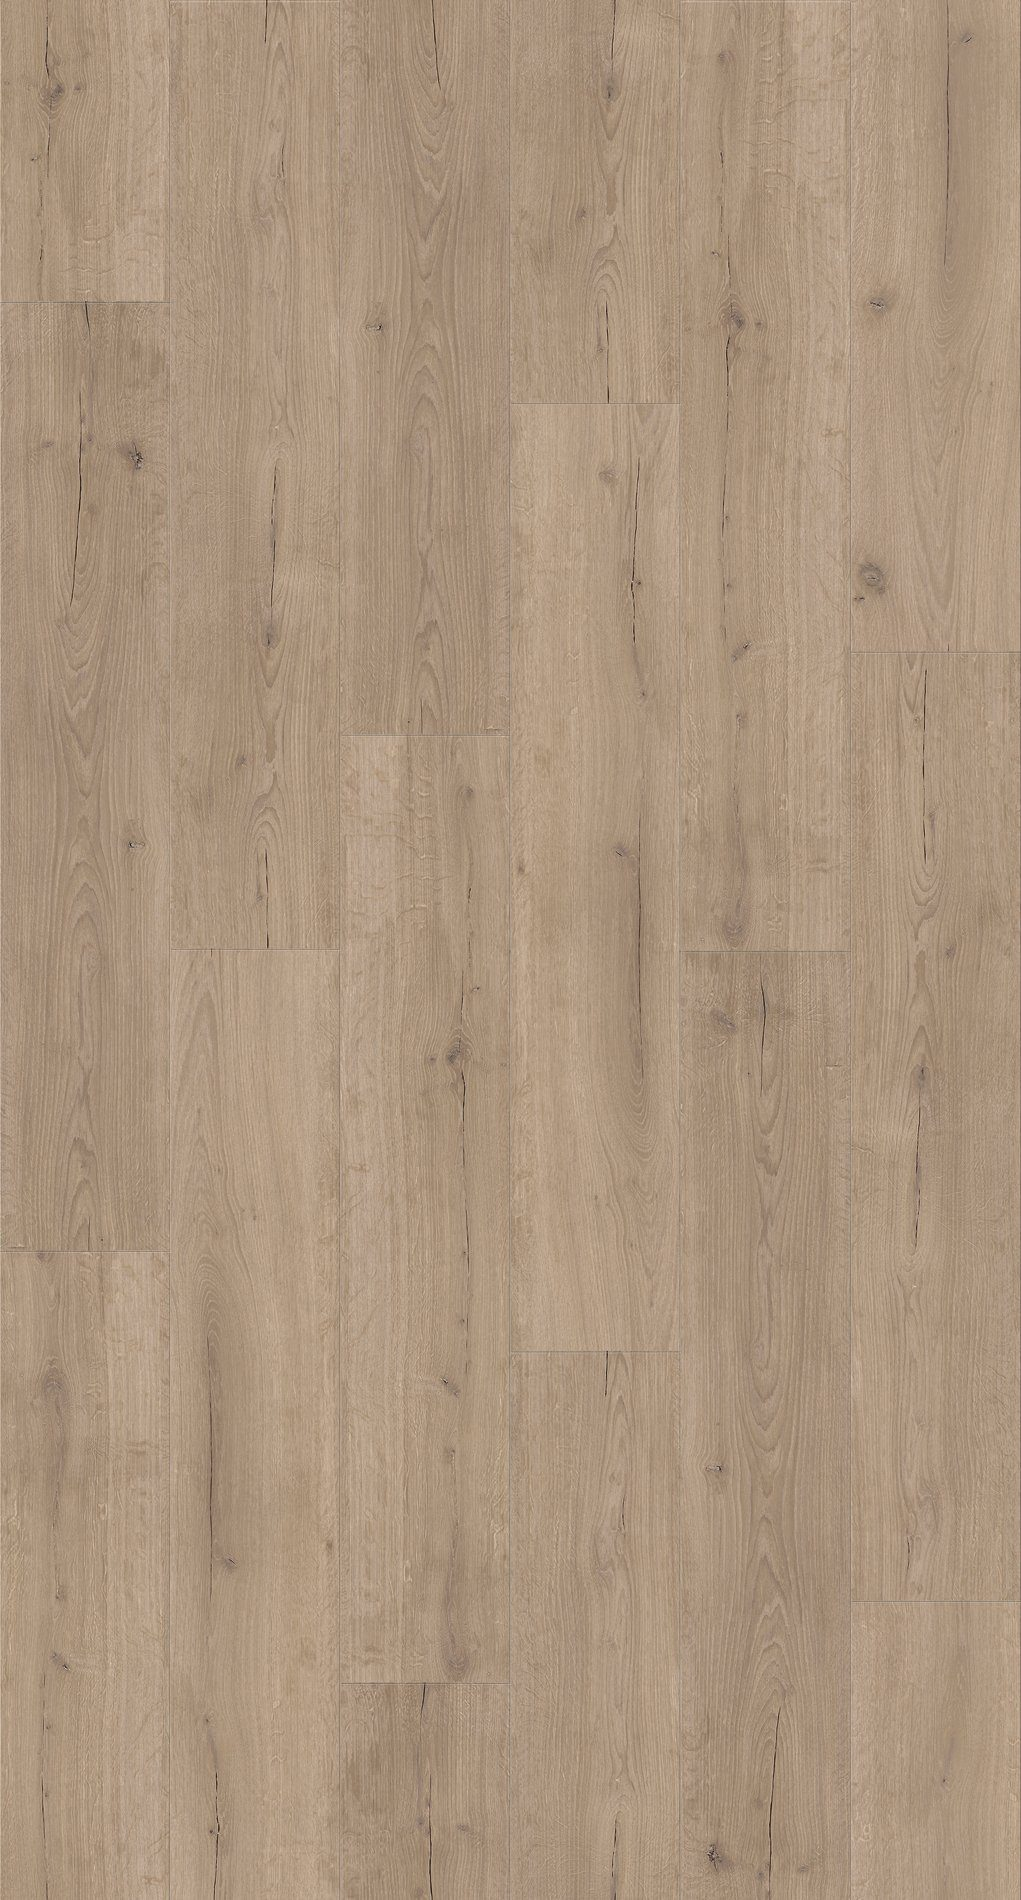 PARADOR Packung: Vinylboden »Basic 4.3 - Eiche Infinity Grau«, 1210 x 219 x 4,3 mm, 2,4 m²